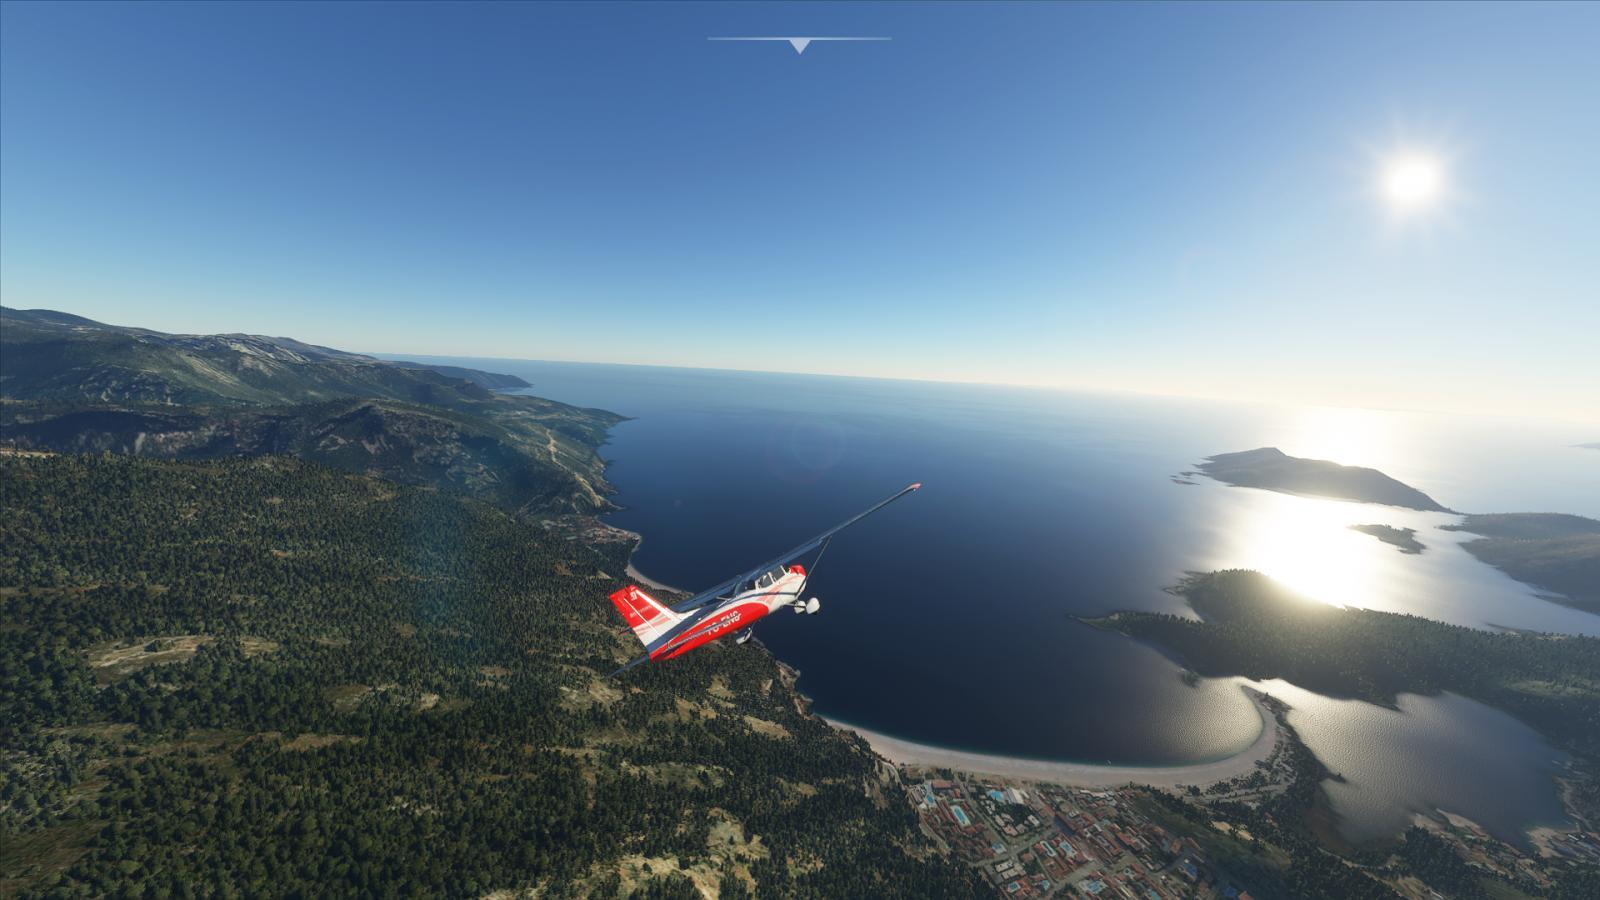 İsim:  Microsoft Flight Simulator Screenshot 2020.08.27 - 20.03.08.12.jpg Görüntüleme: 168 Büyüklük:  136.5 KB (Kilobyte)